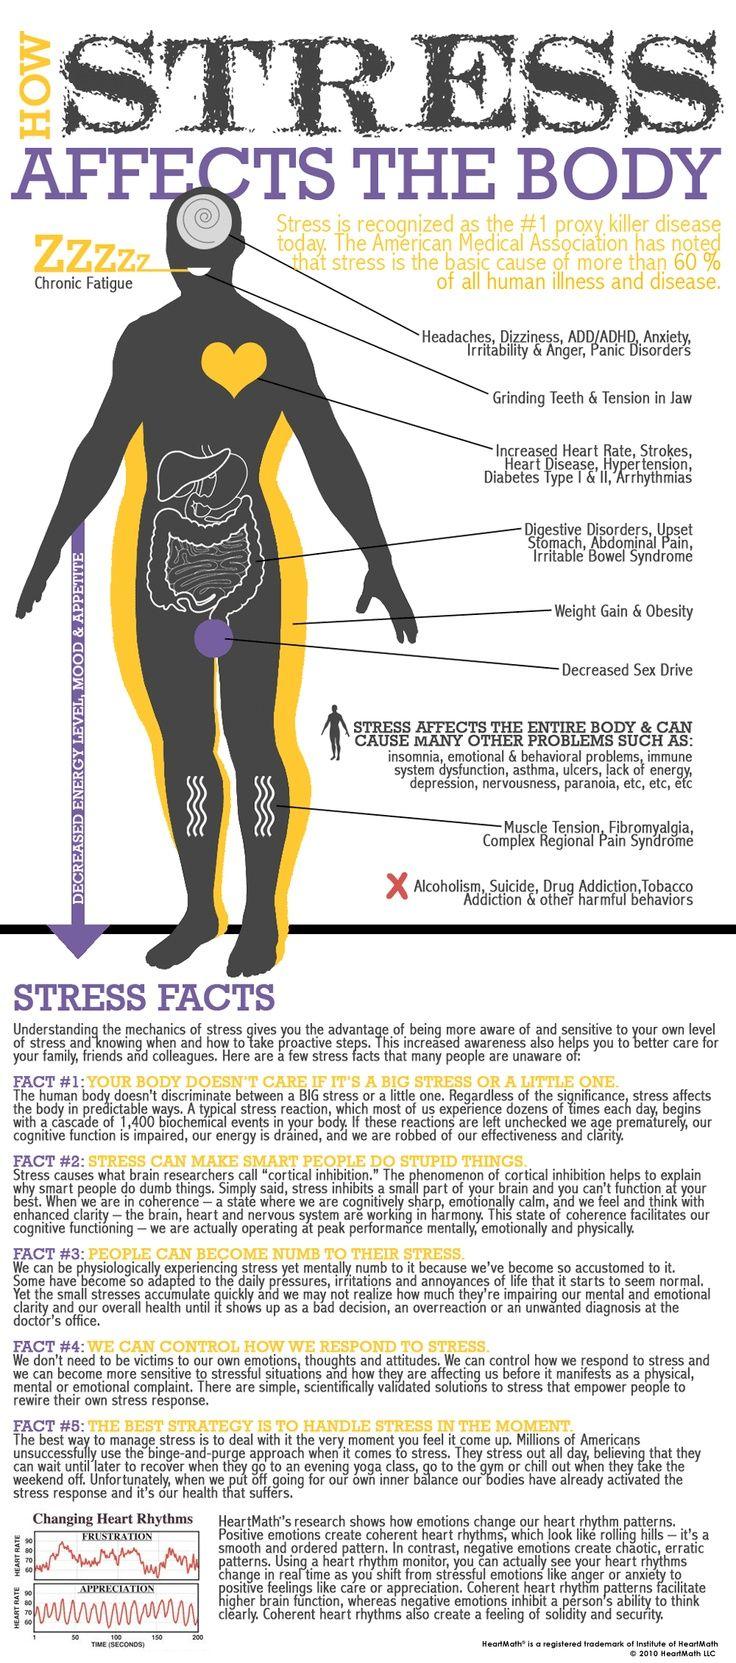 How stress affects the body. Follow us @ http://pinterest.com/stylecraze/health-and-wellness/  for more updates.